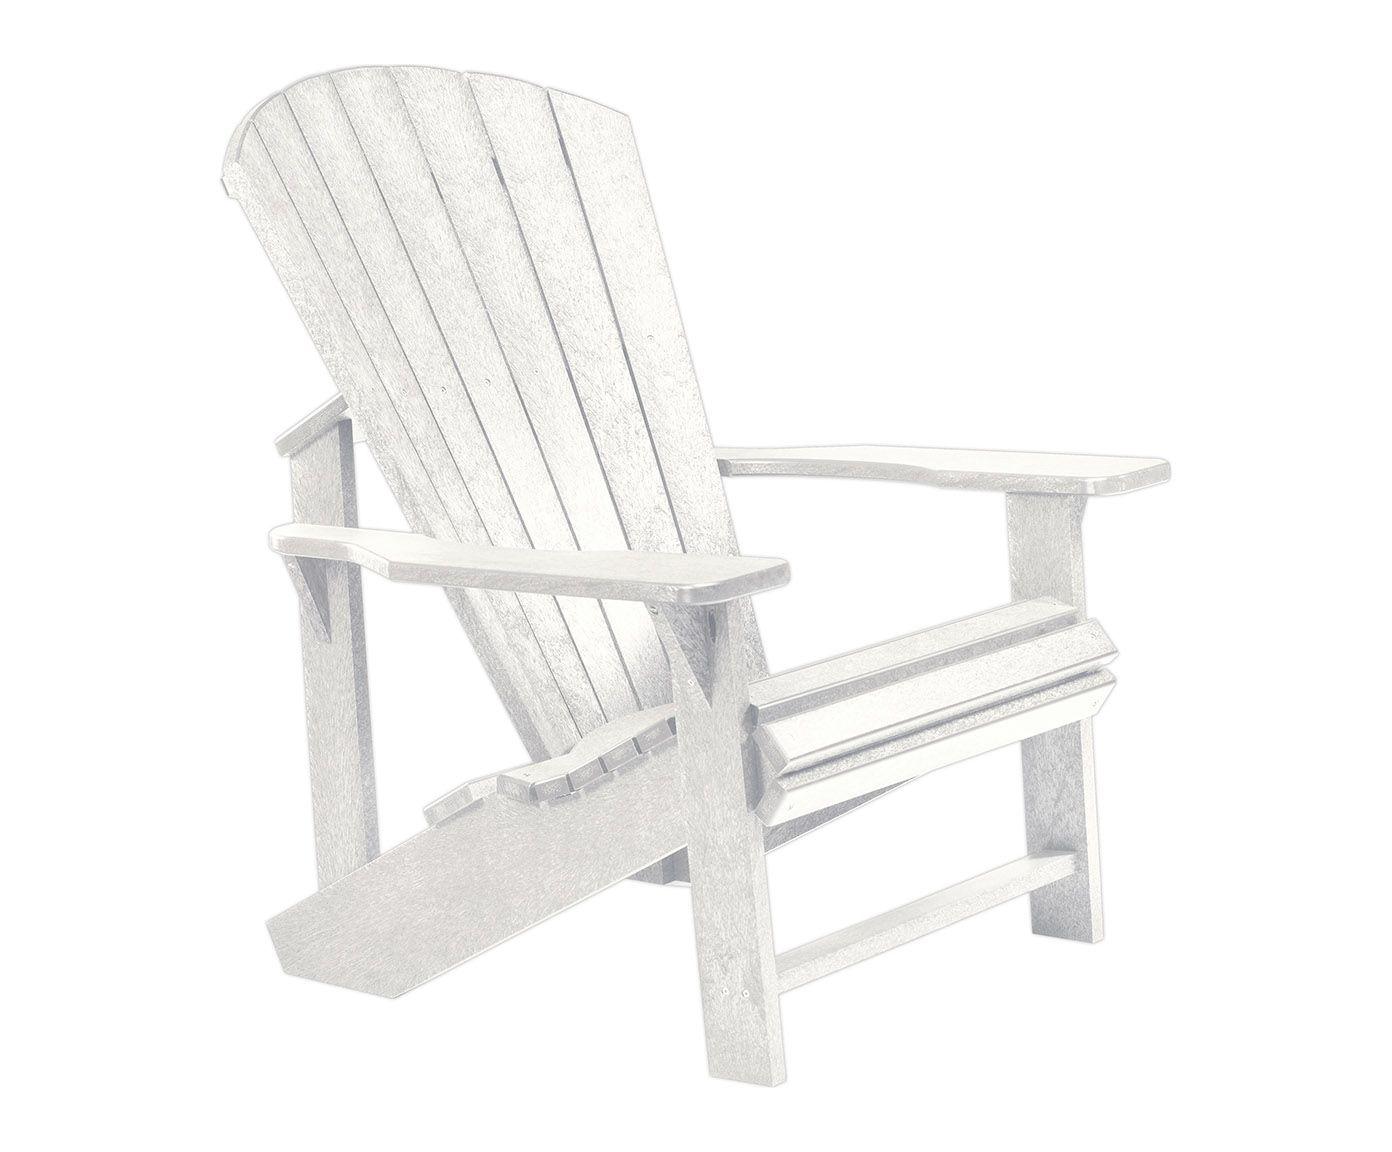 adirondack stuhl addy aus recyceltem kunststoff, b 79 cm   westwing